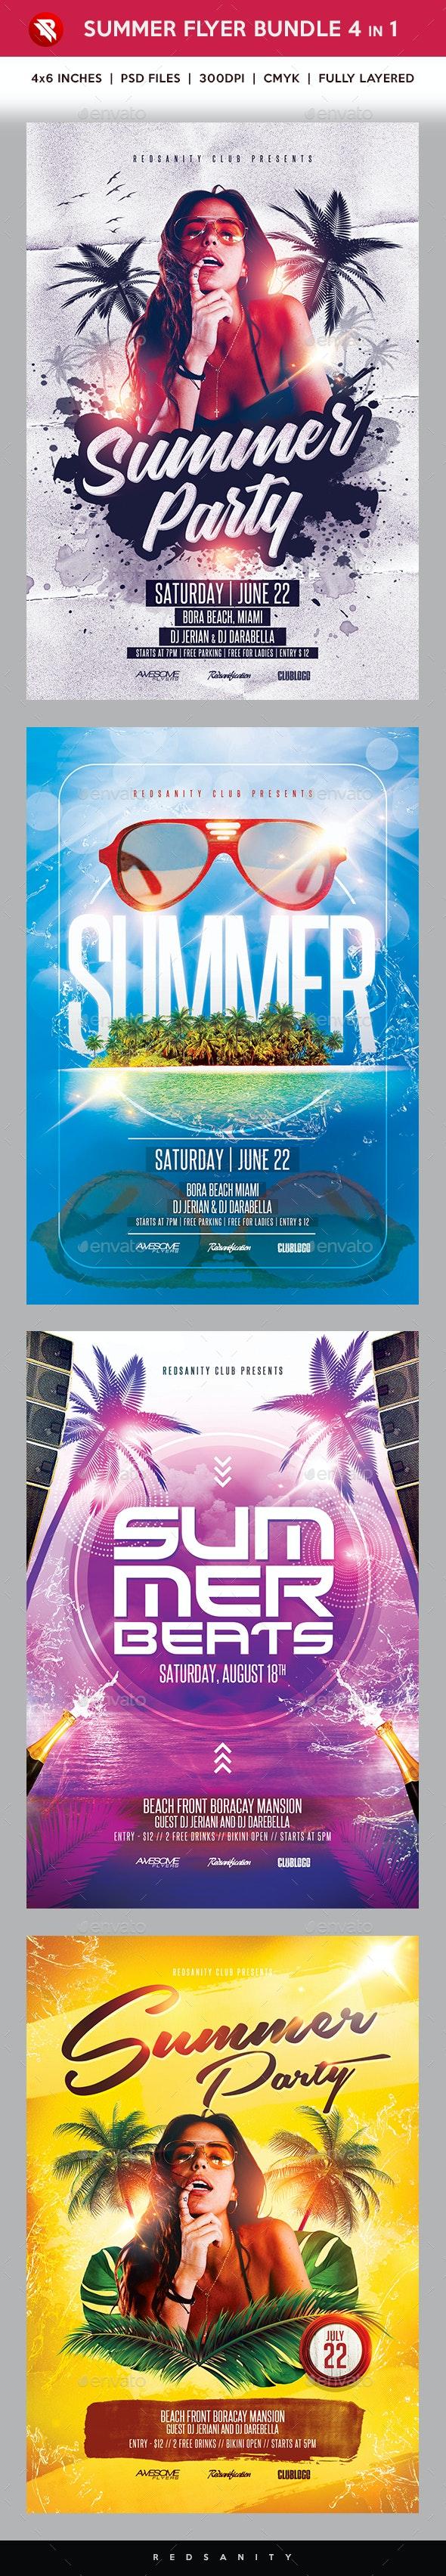 Summer Flyer Bundle 4 in 1 - Clubs & Parties Events